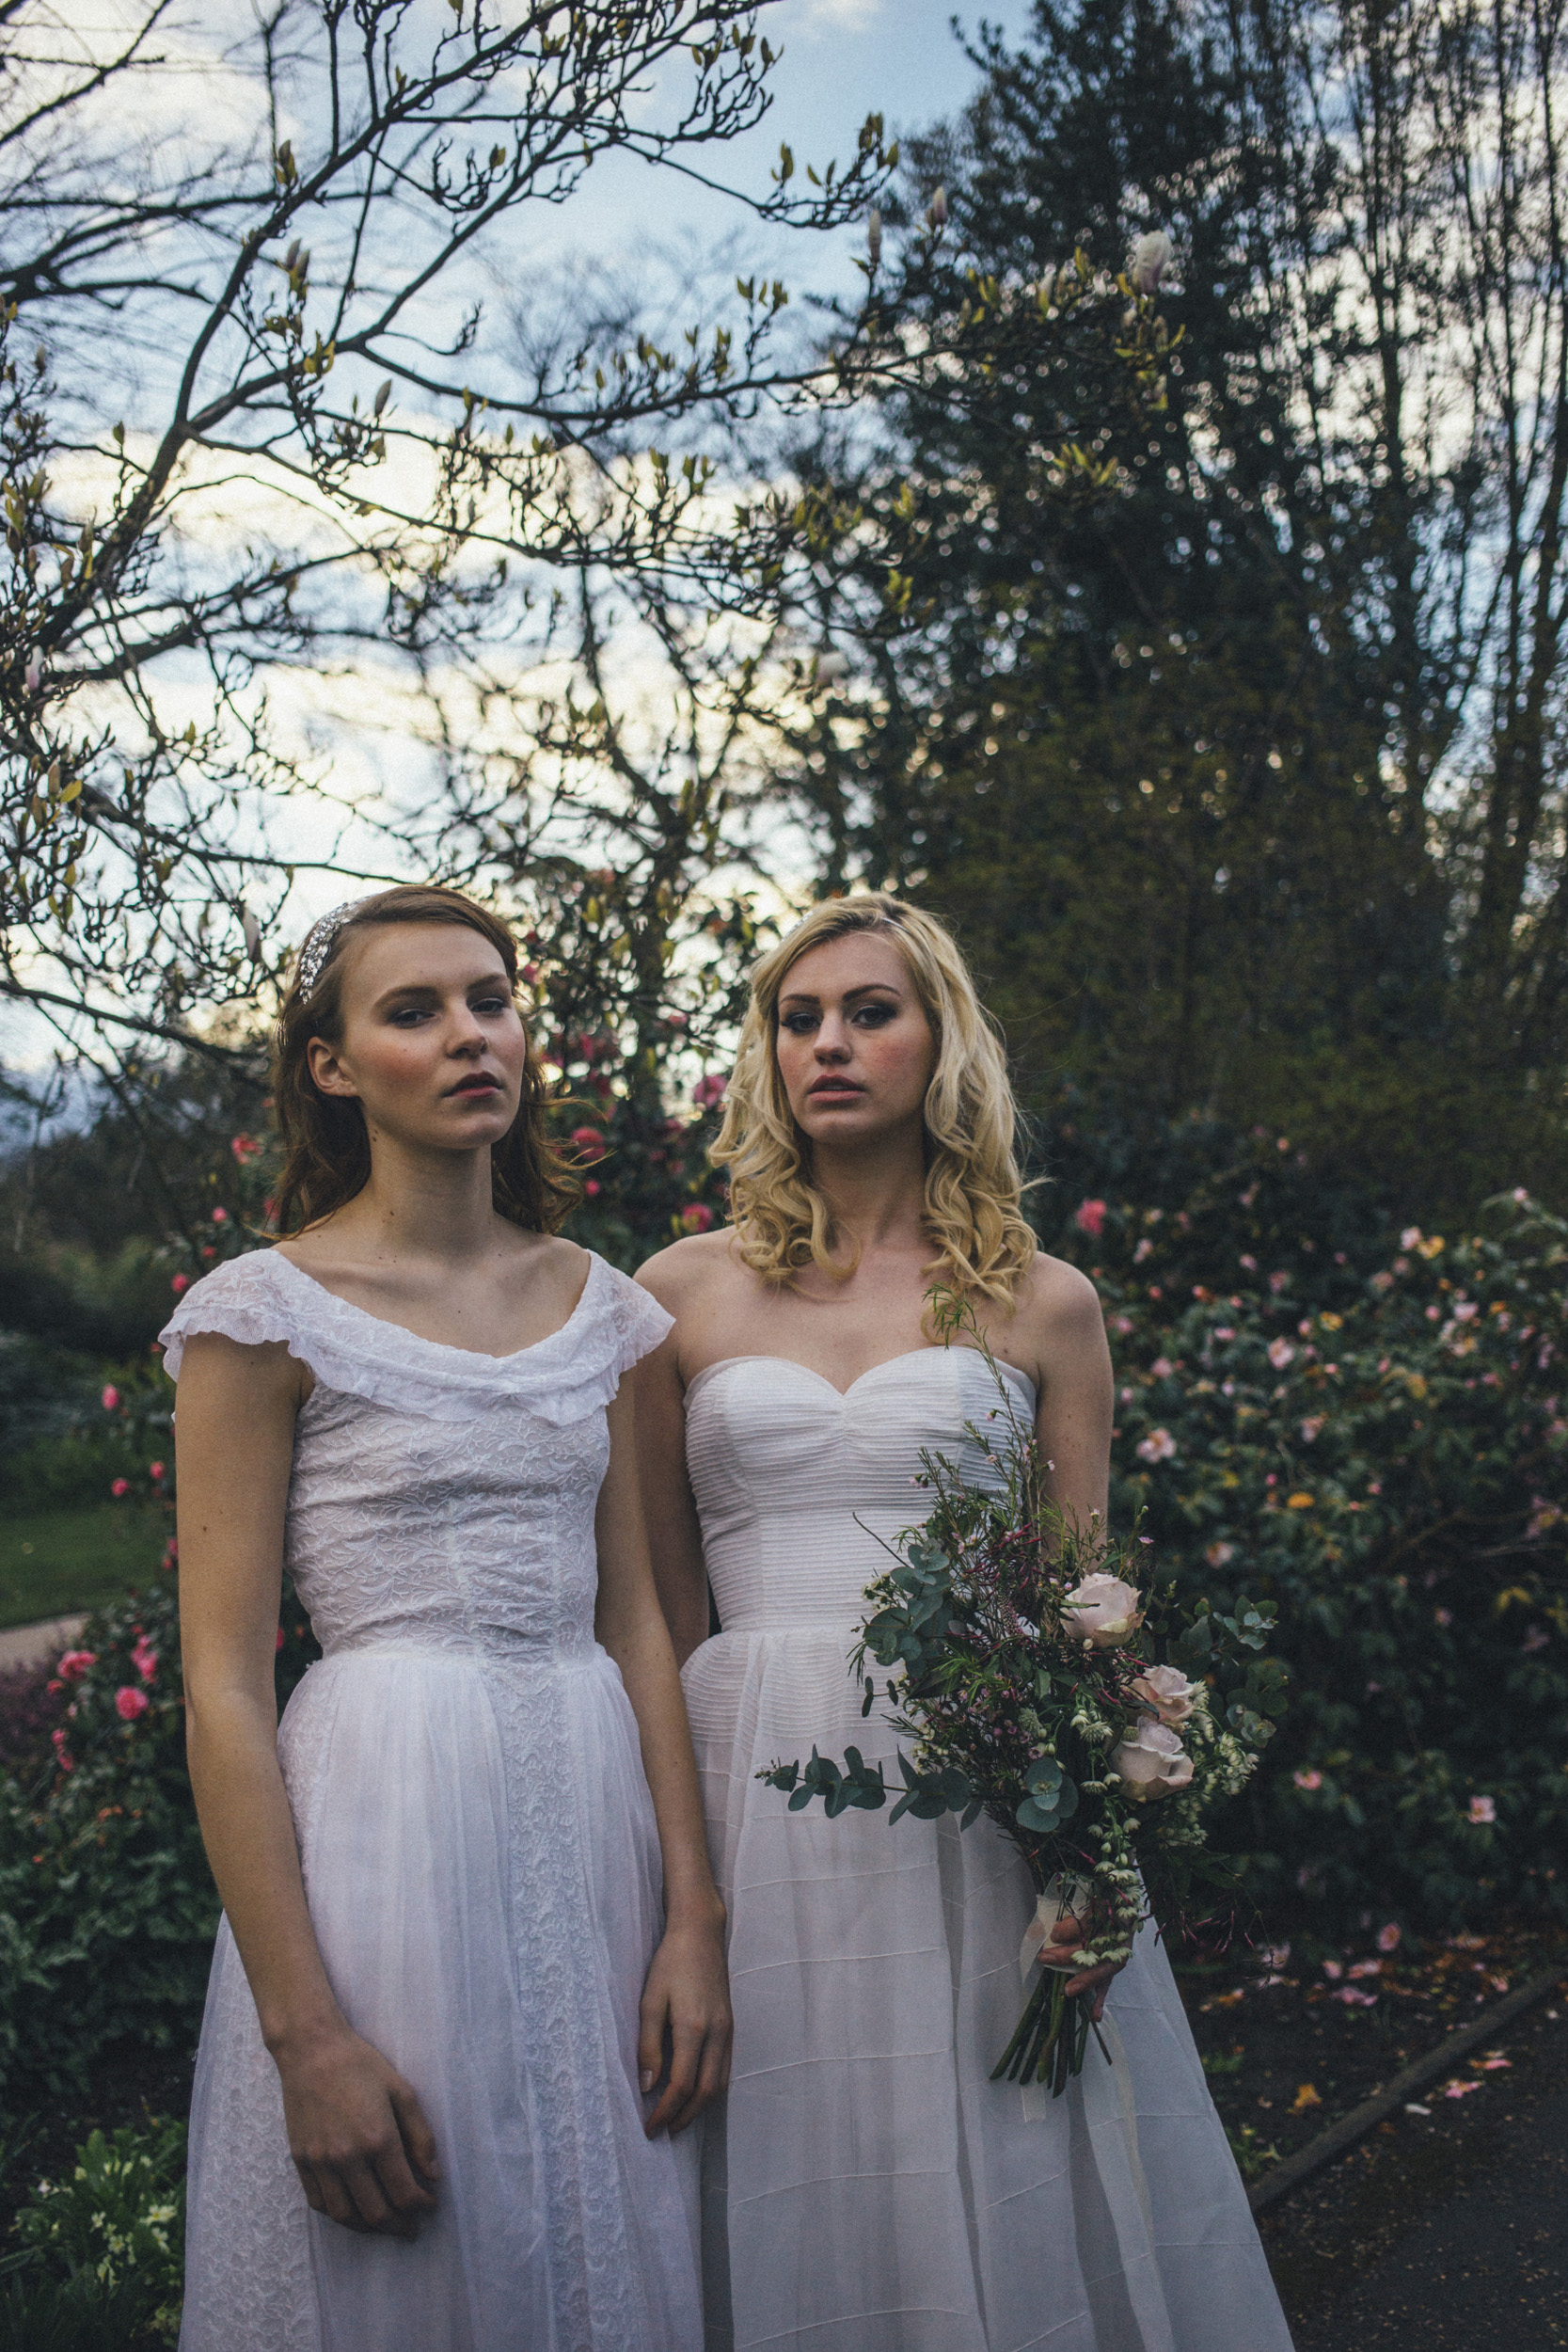 Spring-Bridal-Kate-Beaumont-Shelley-Richmond-Vintage-Wedding-Dress-17.jpg